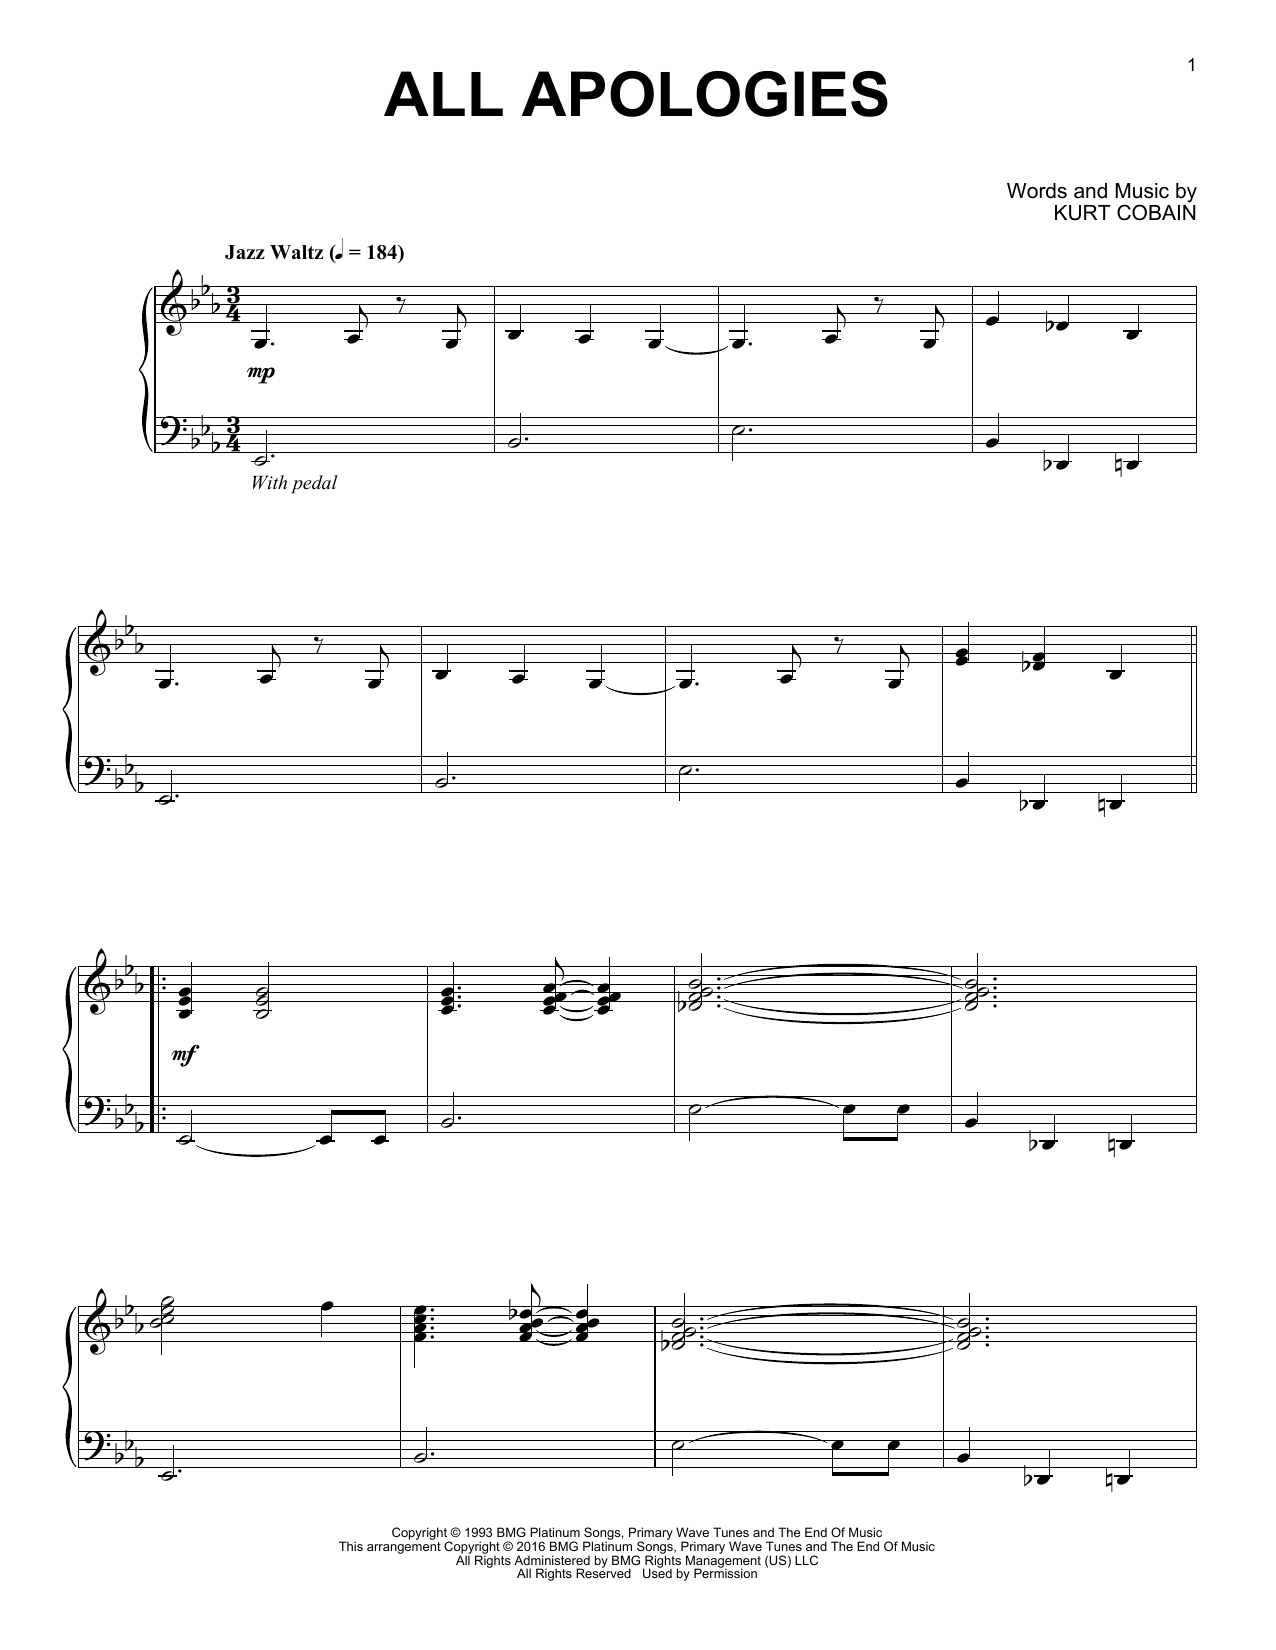 Nirvana All Apologies [Jazz version] sheet music notes and chords. Download Printable PDF.